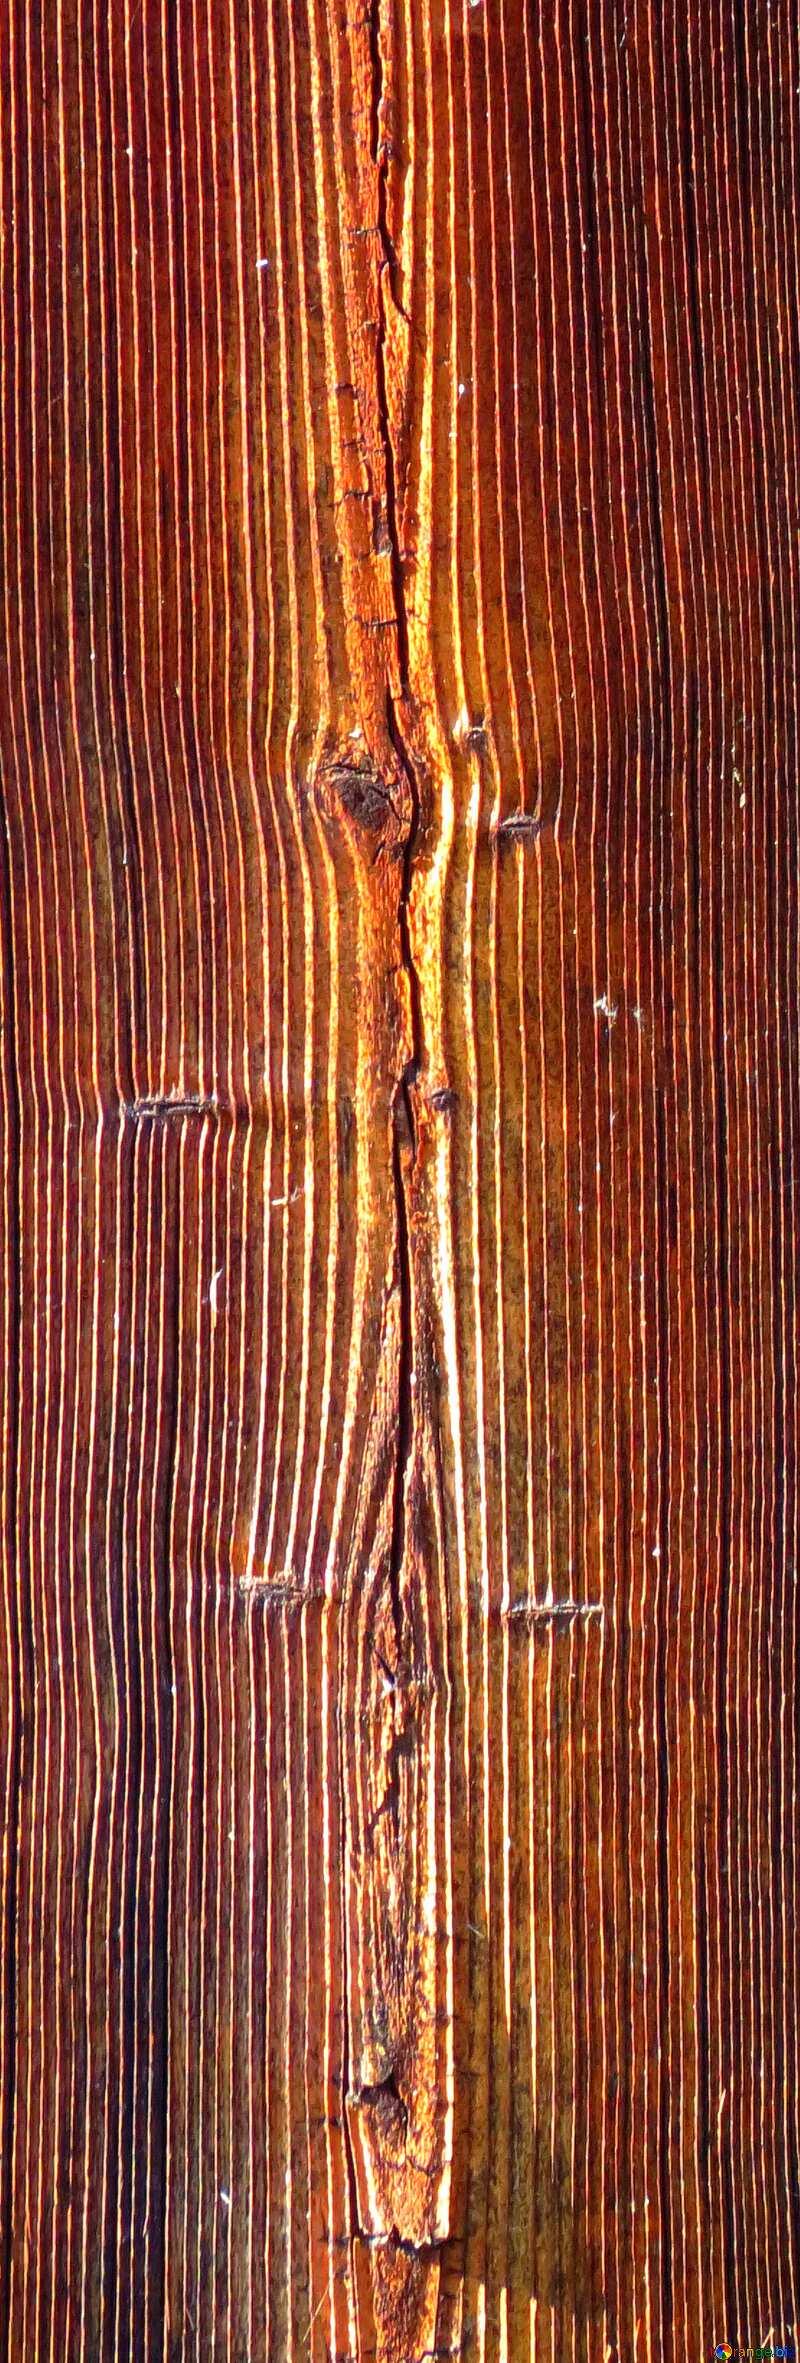 Bright colors. Texture of wood fibers. №28735